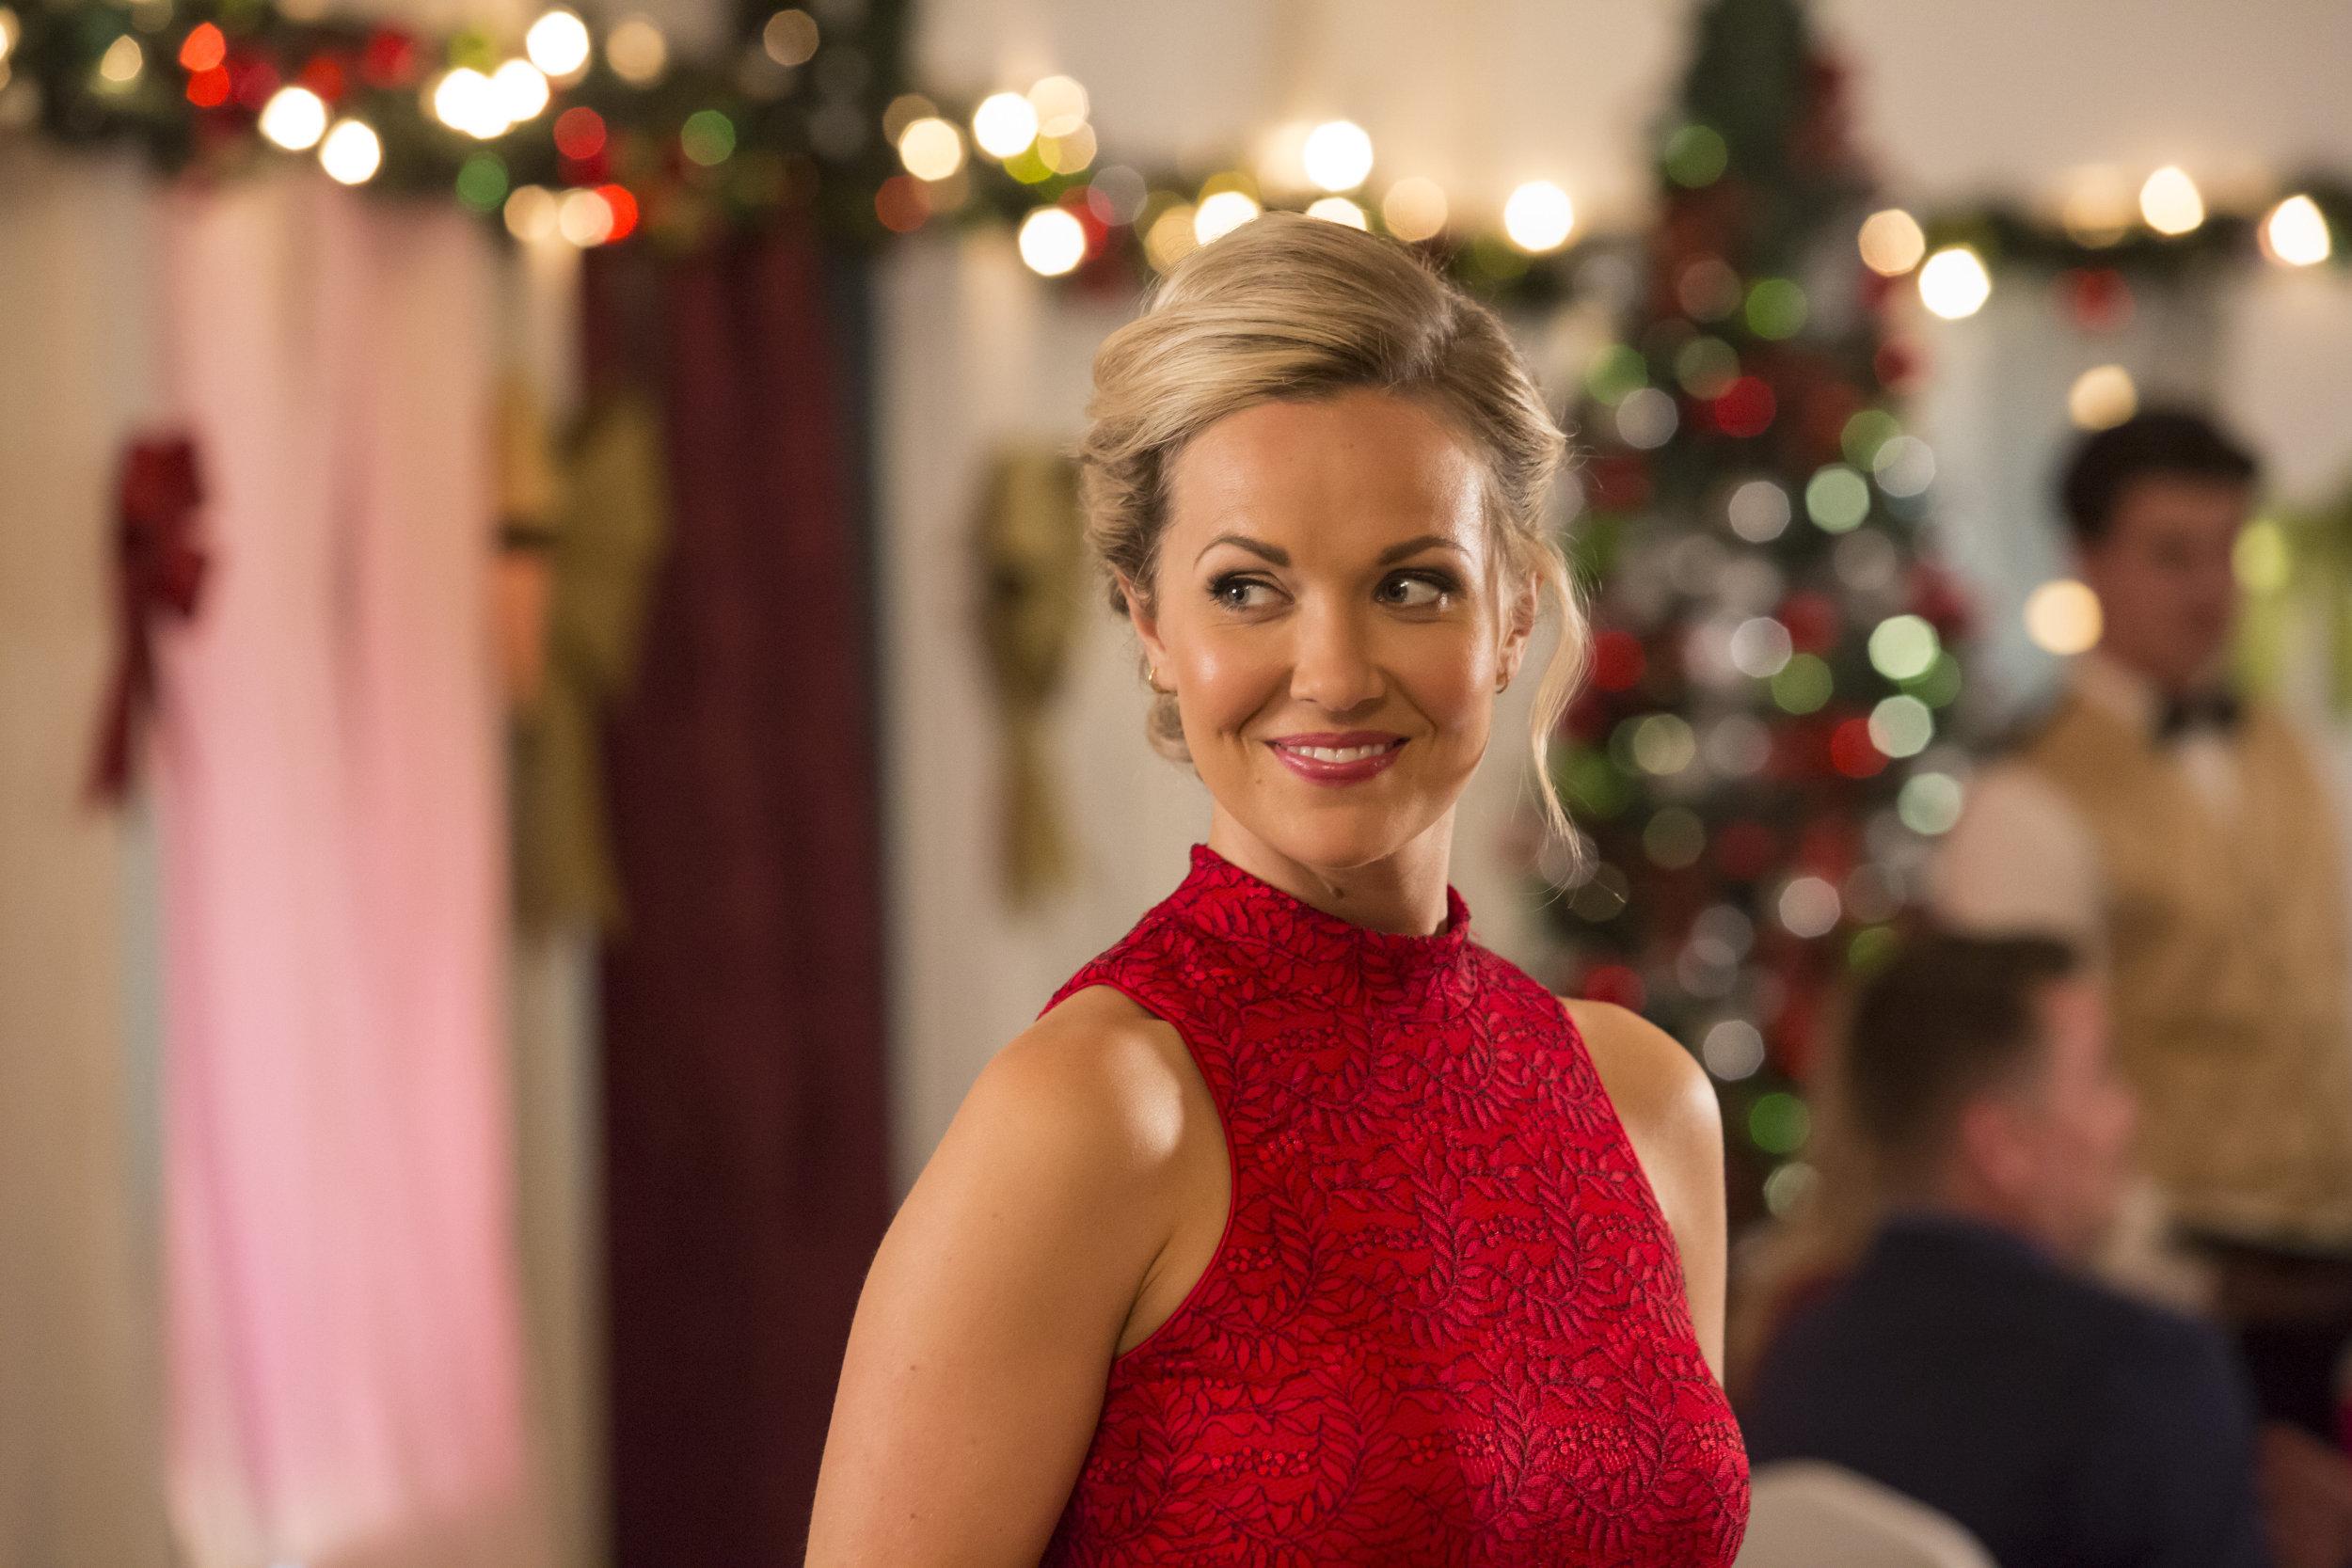 With Love Christmas.Cast Interviews Emilie S Danish Secret Santa With Love